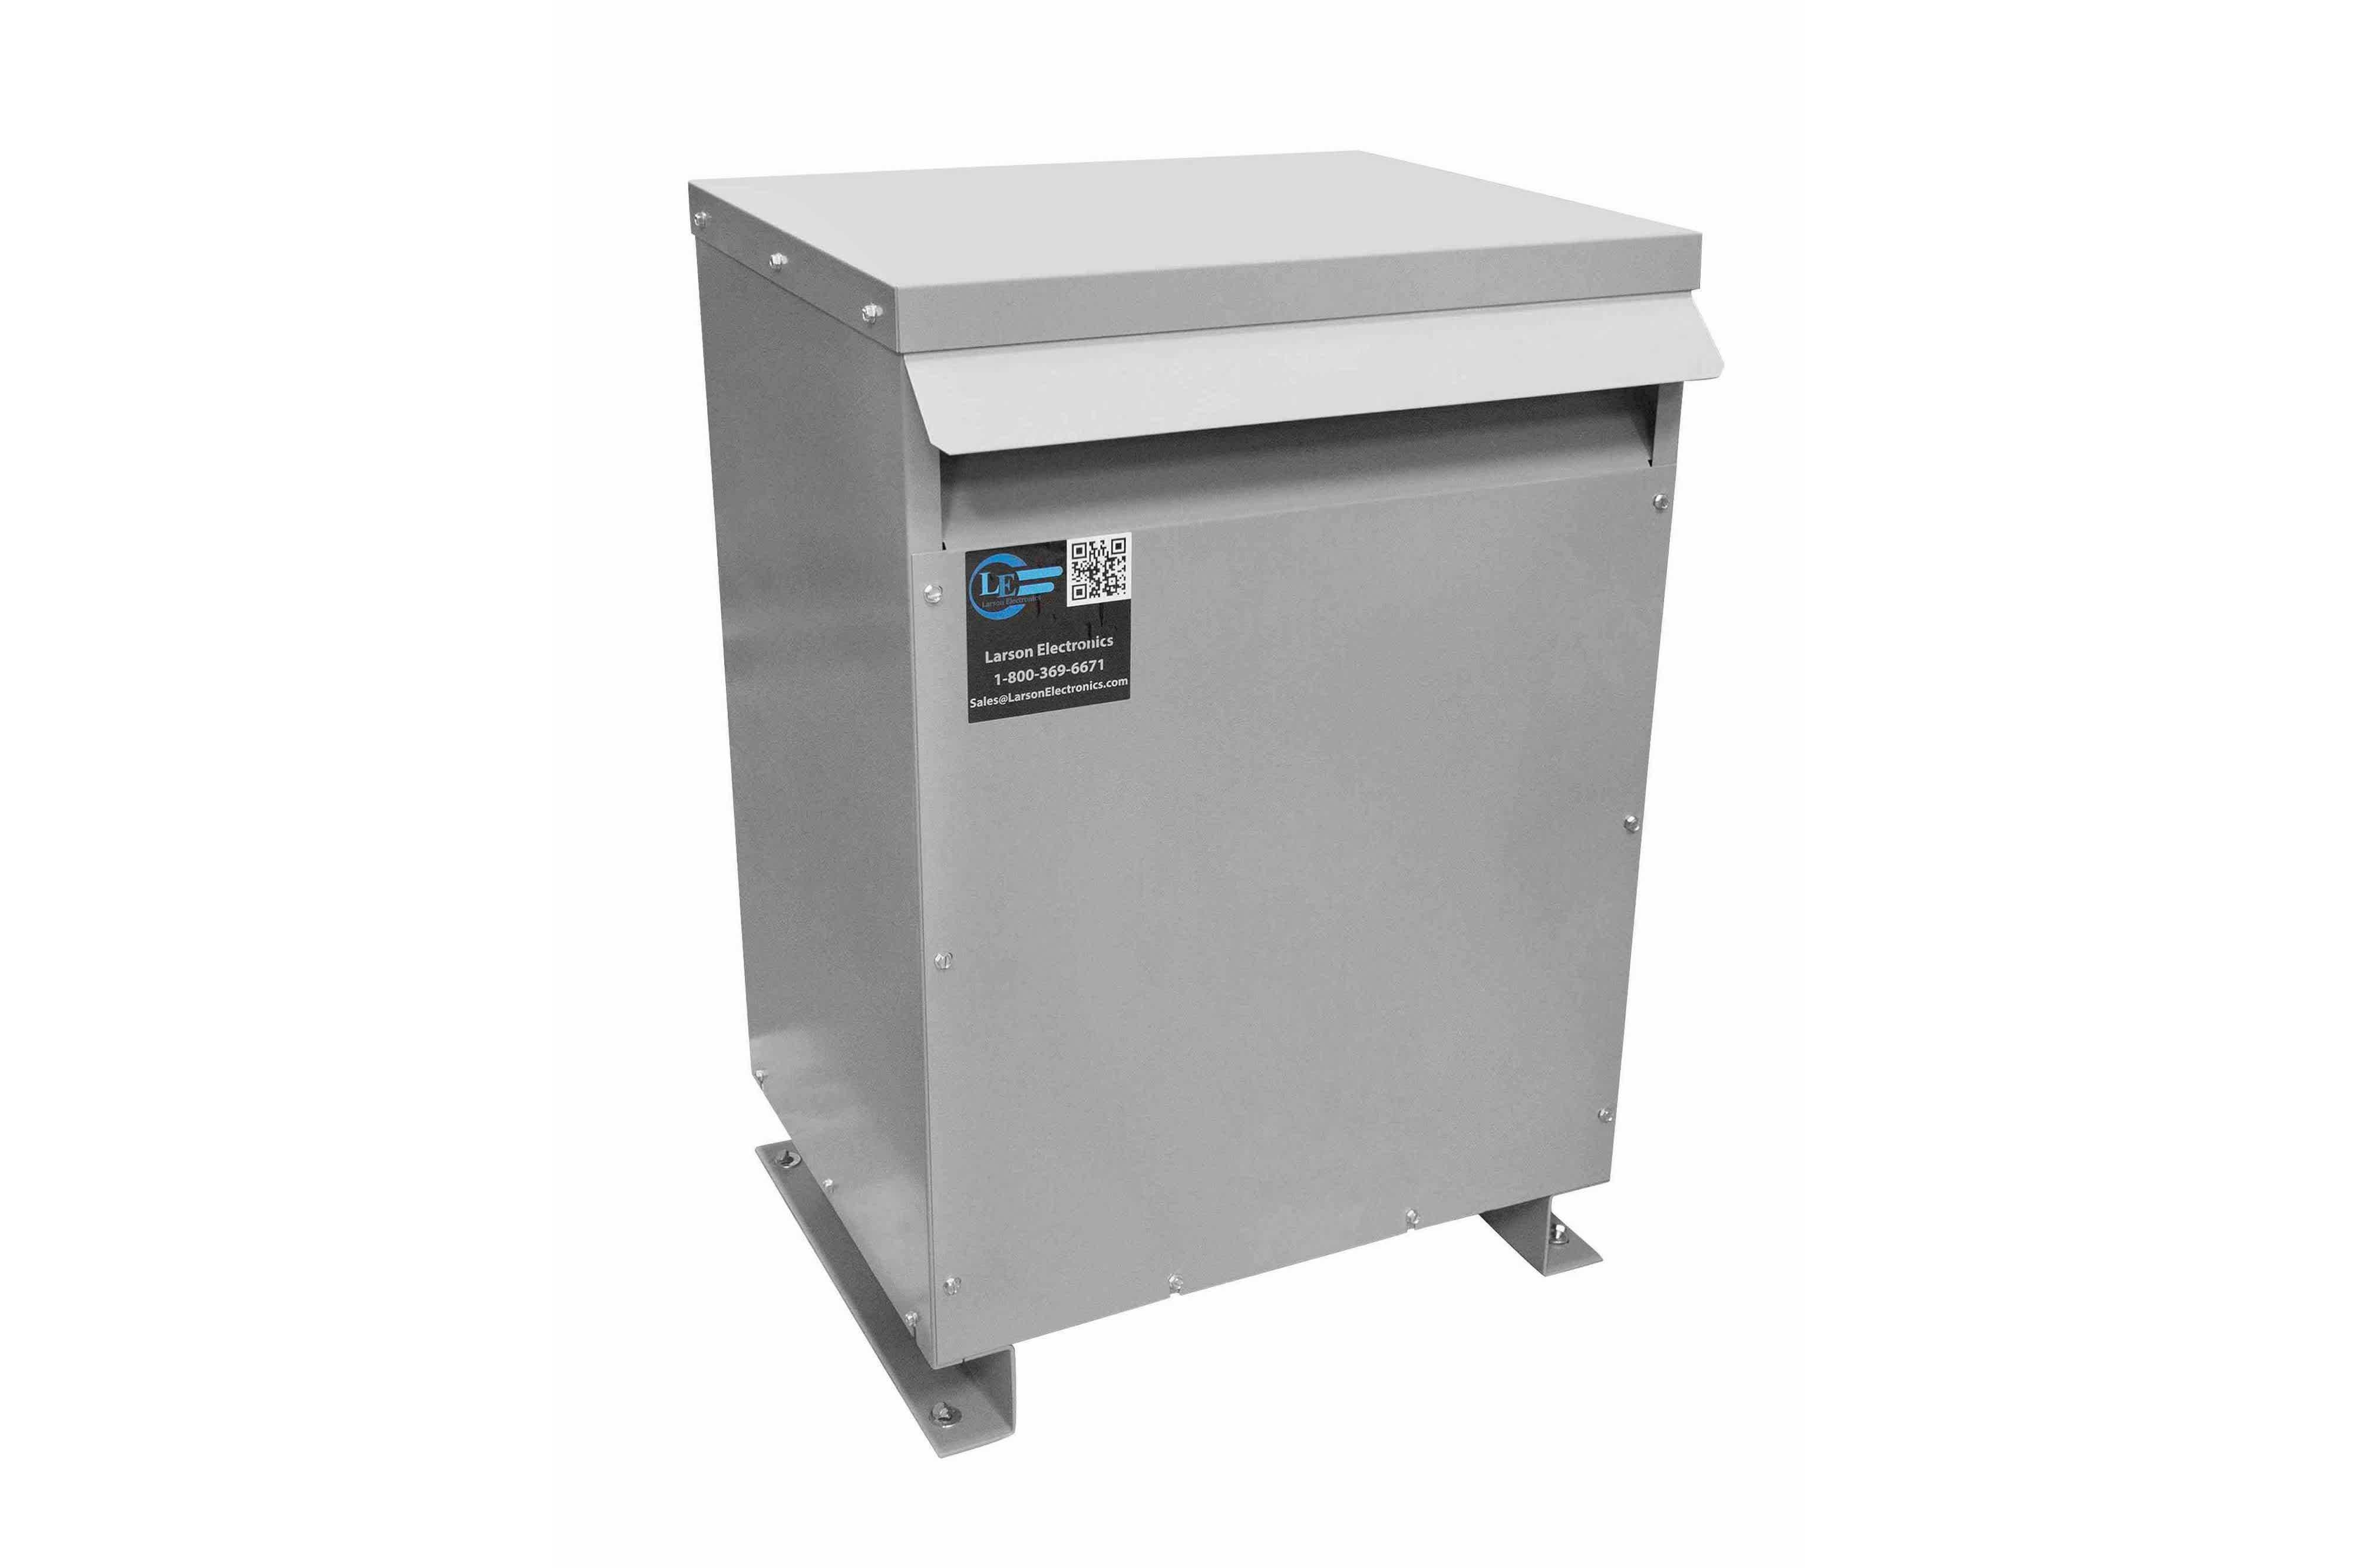 40 kVA 3PH Isolation Transformer, 460V Wye Primary, 400V Delta Secondary, N3R, Ventilated, 60 Hz